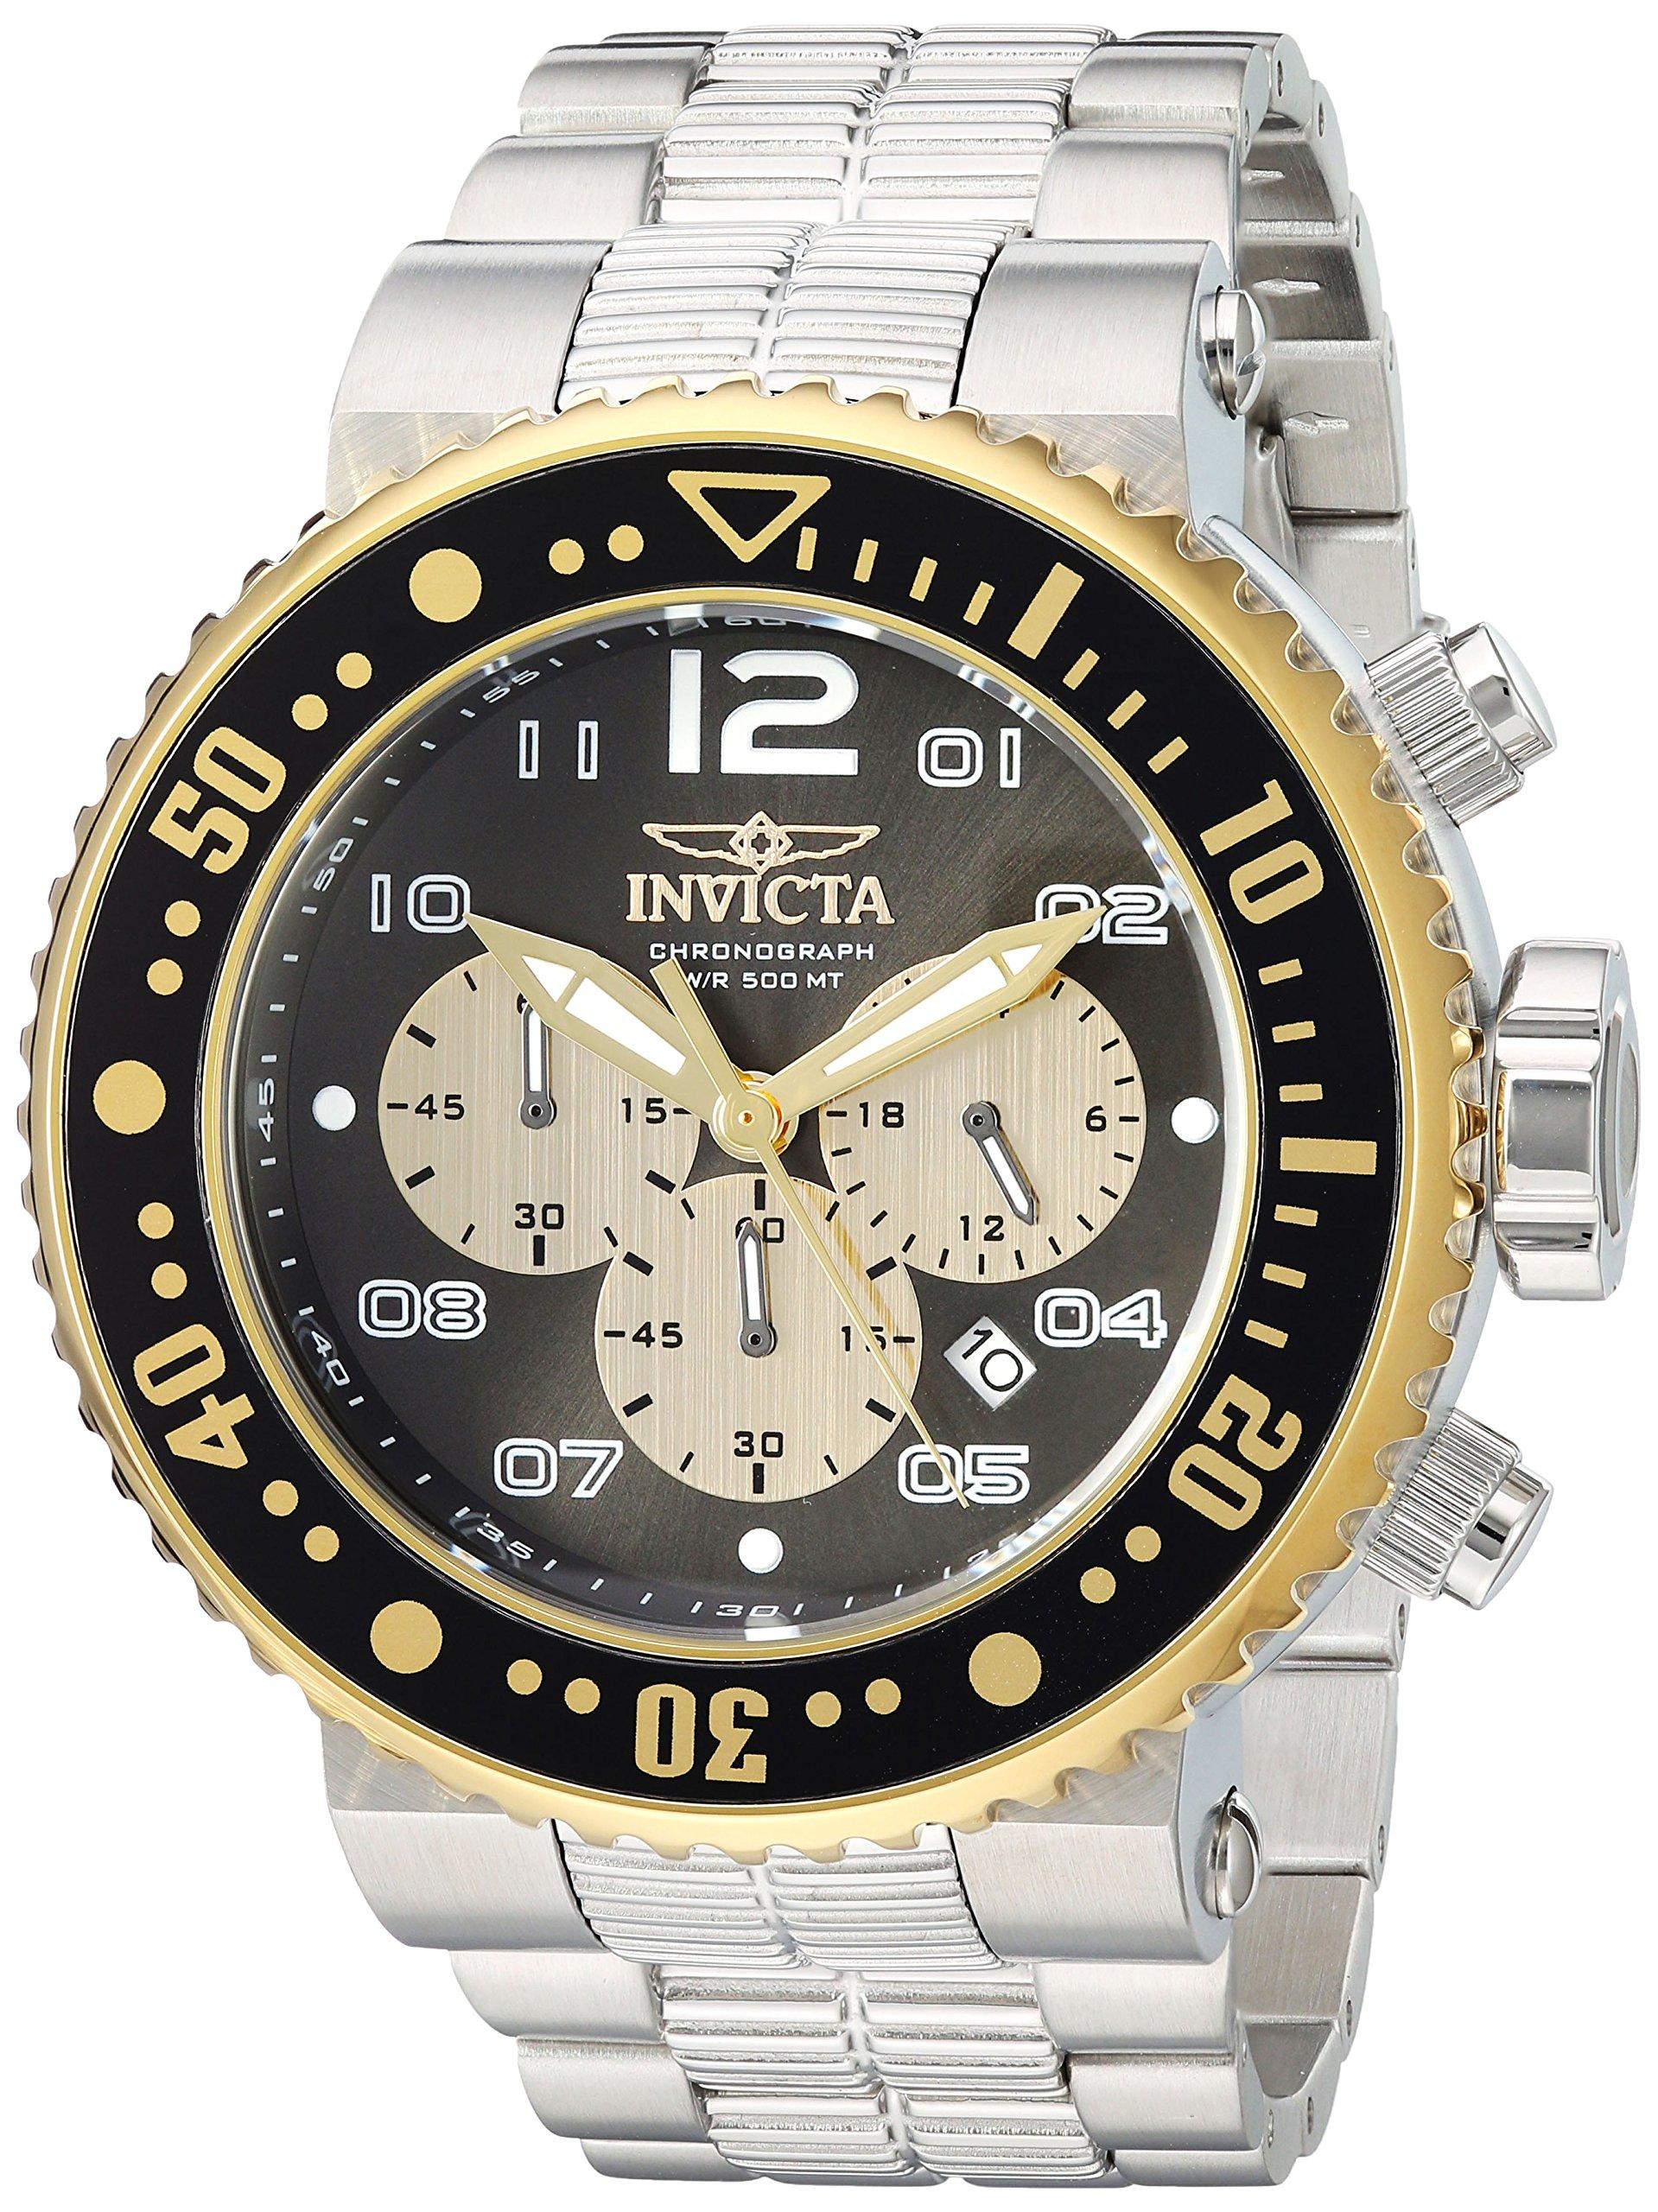 Invicta Men's Pro Diver Quartz Watch with Stainless-Steel Strap, Silver, 22 (Model: 25075) by Invicta